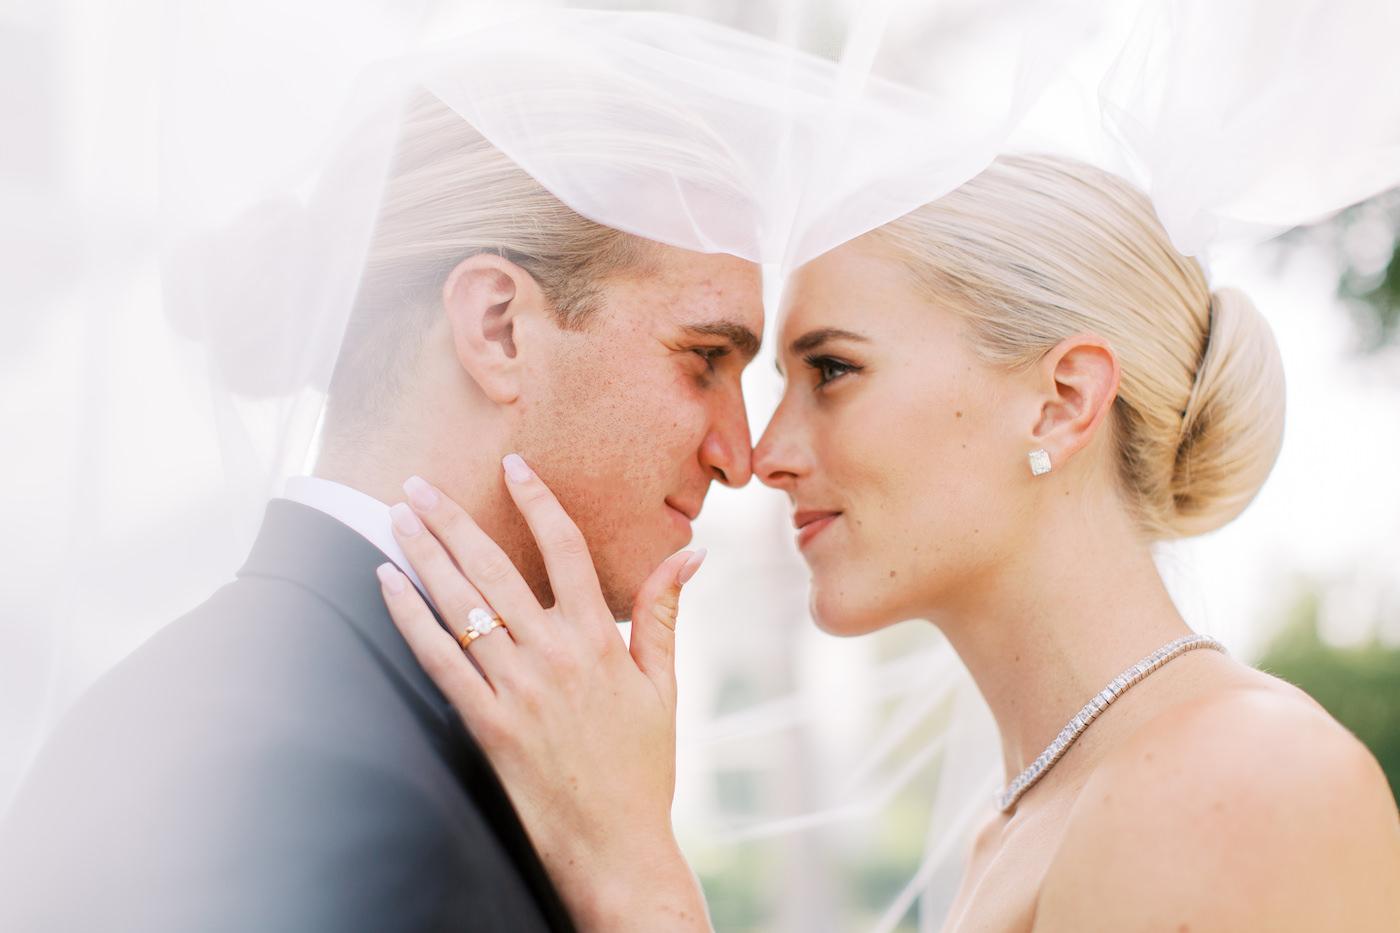 Romantic Classic Timeless Bride and Groom Wedding Portrait Under Wedding Veil